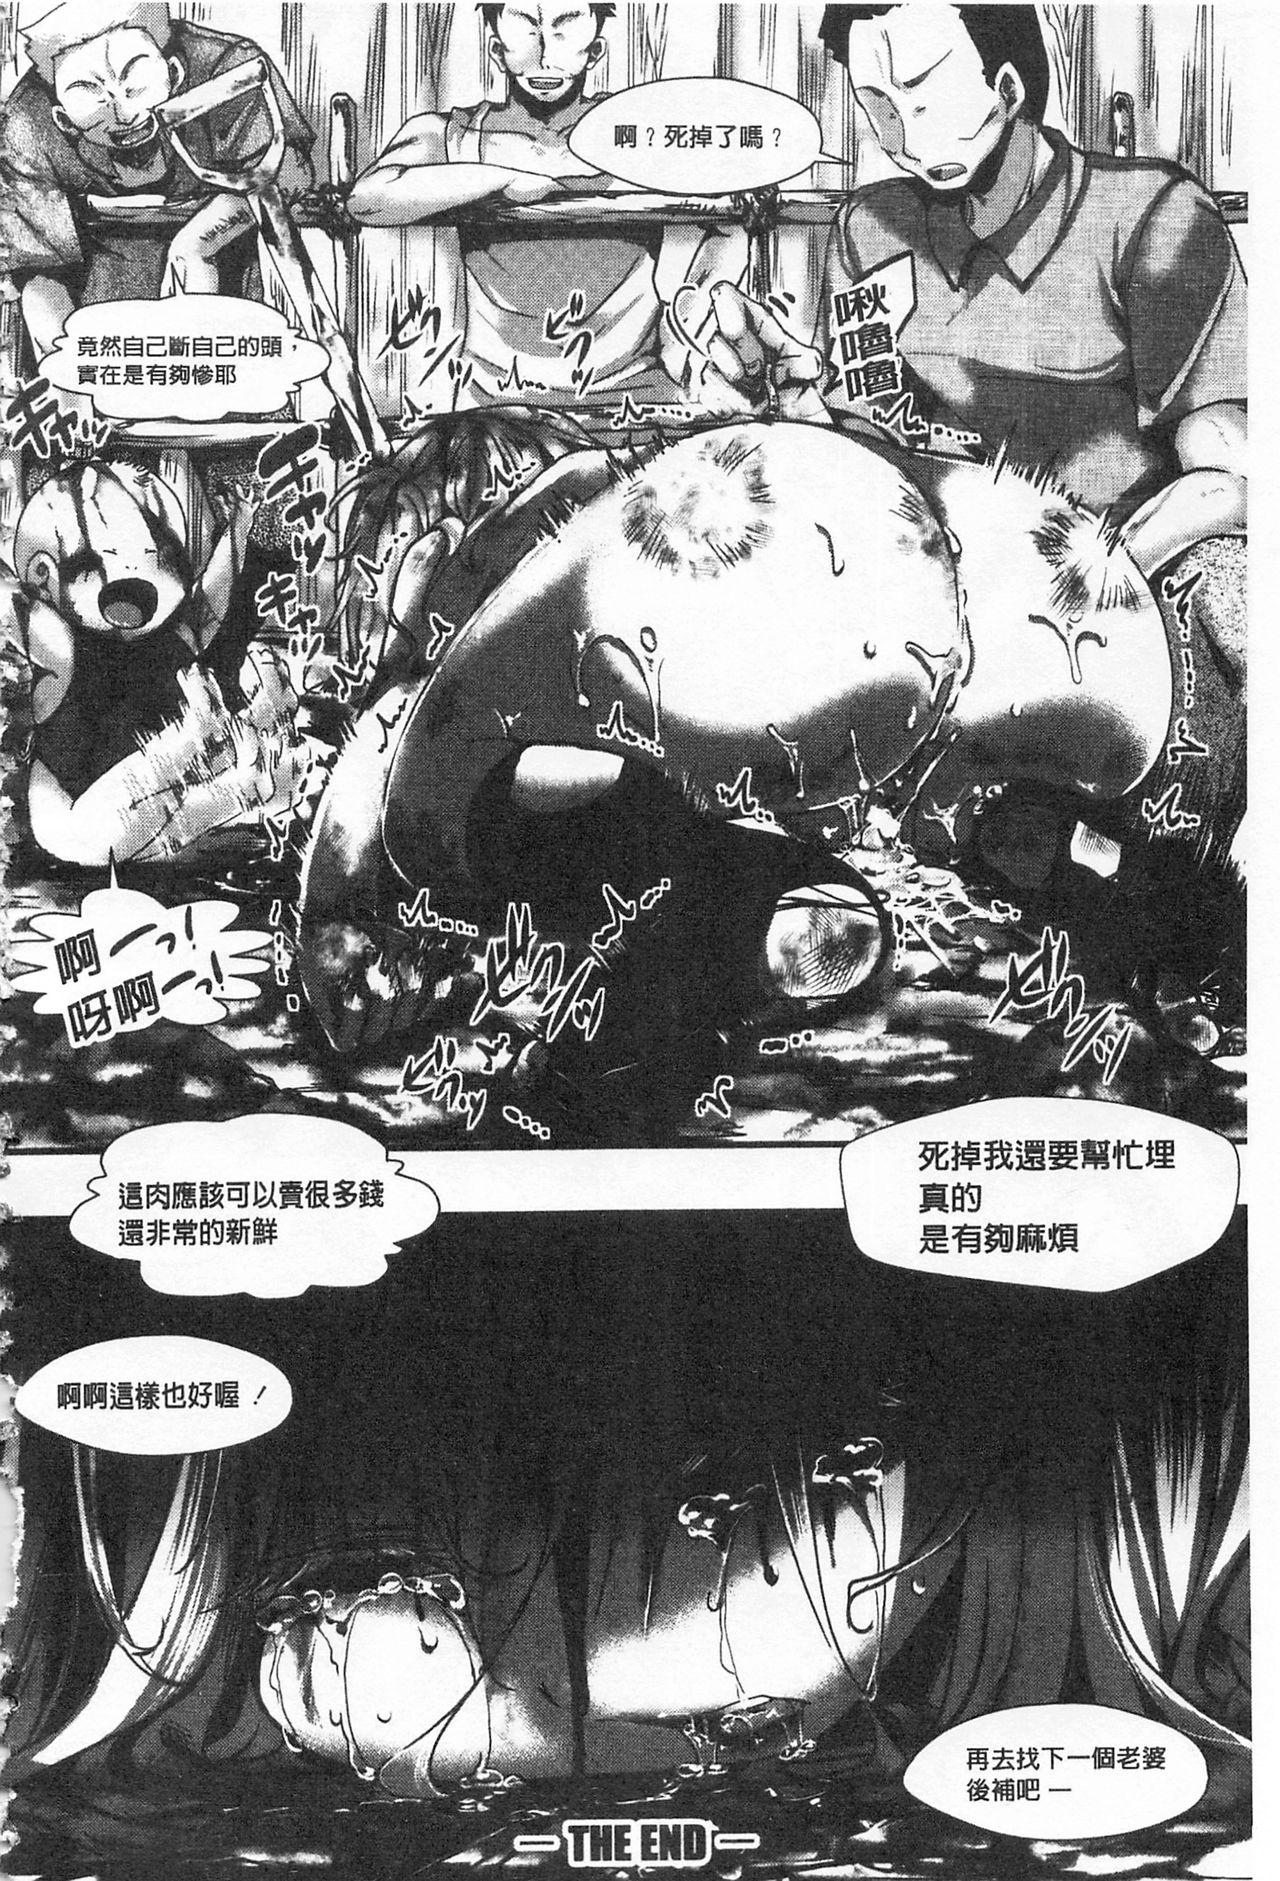 [hal] Daienjou -Ikare Ikasare Iki Ikare-   ∞艶嬢 -洩出來被搞到洩掛了被搞掛-  [Chinese] 117